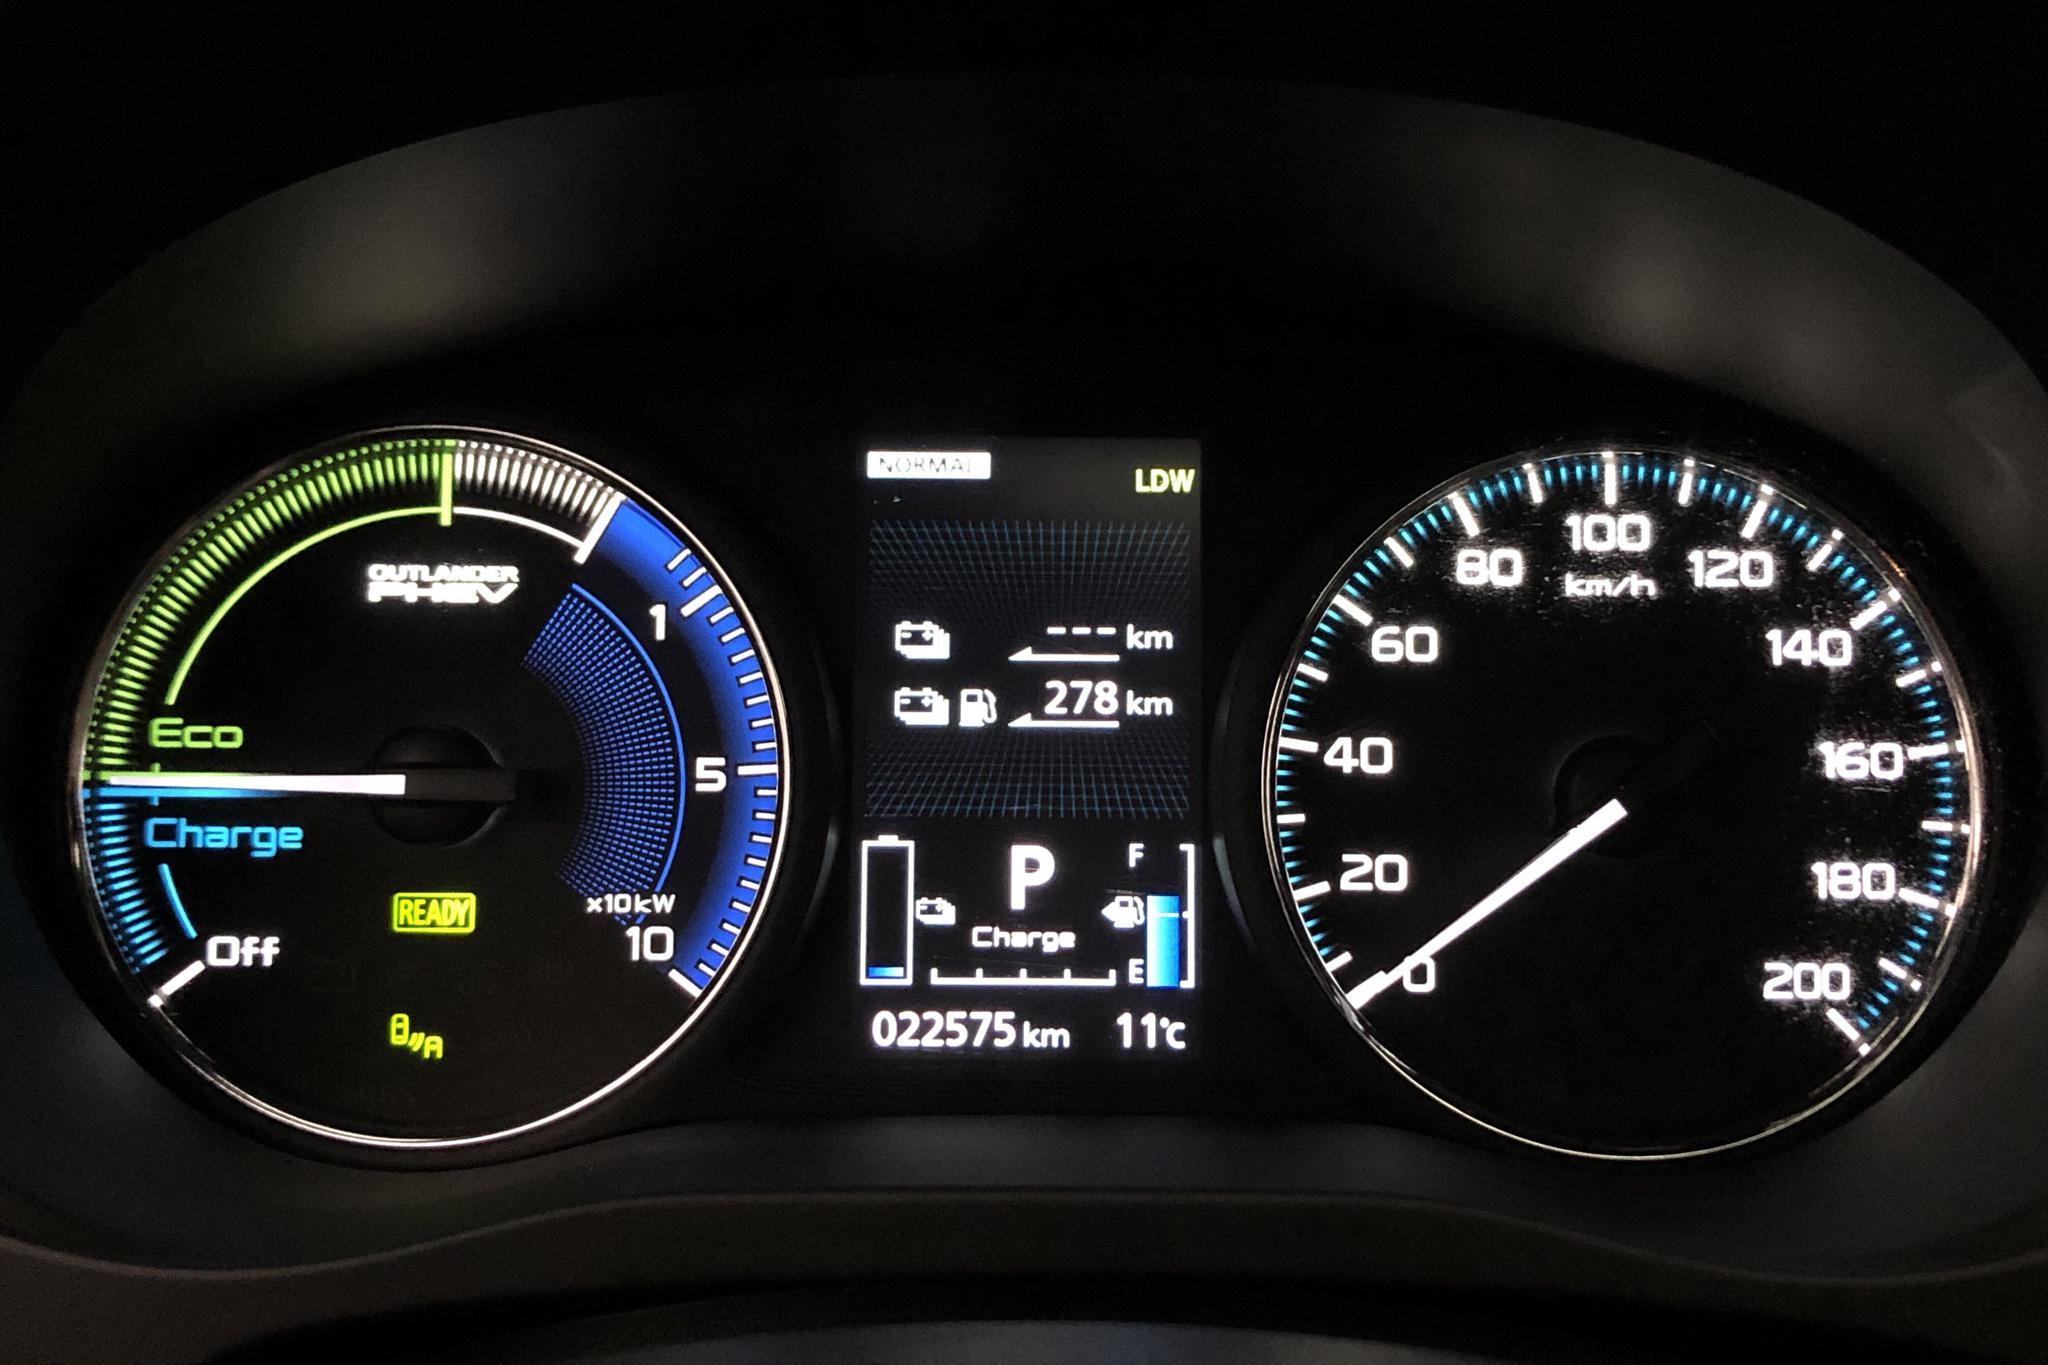 Mitsubishi Outlander 2.4 Plug-in Hybrid 4WD (136hk) - 22 570 km - Automatic - black - 2019